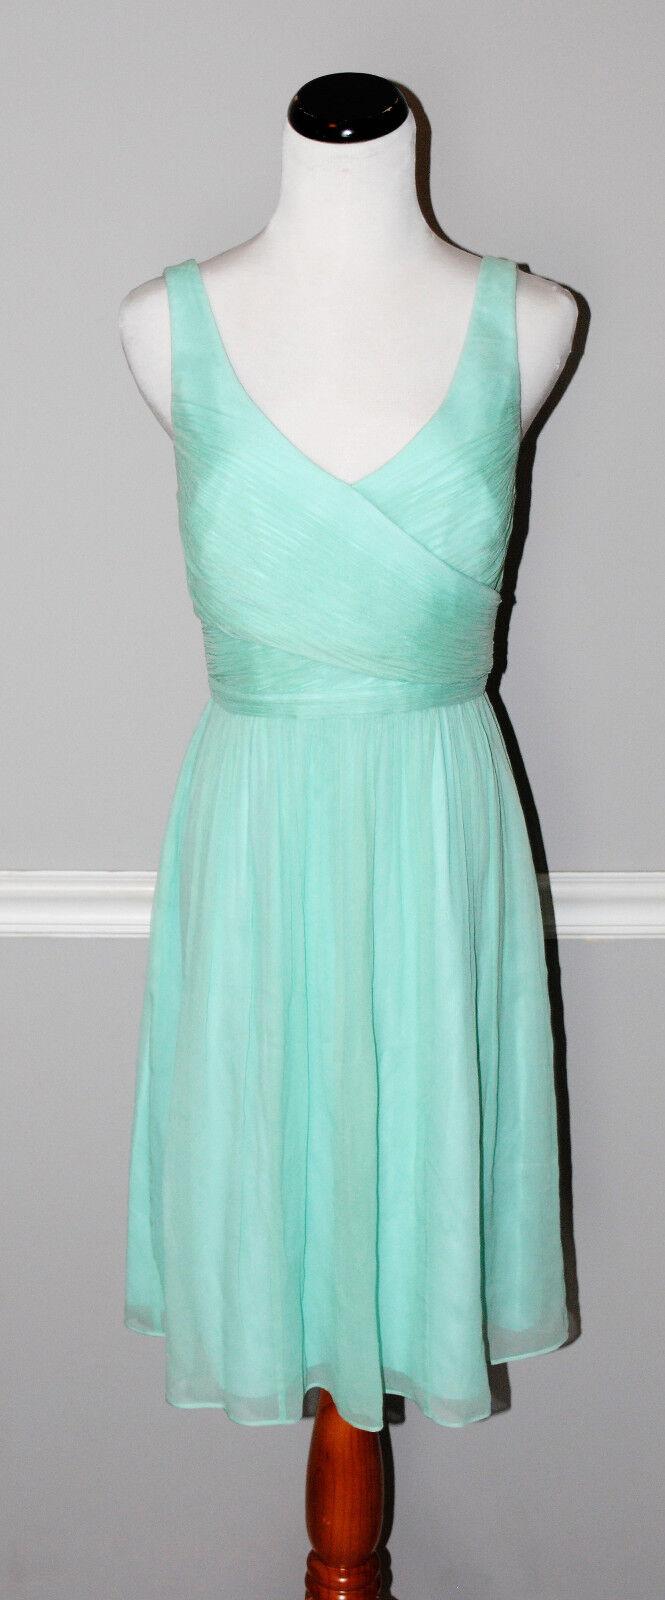 J.Crew Heidi Dress in Silk Chiffon #93100 Sleeveless Bright Seaside Aqua 6